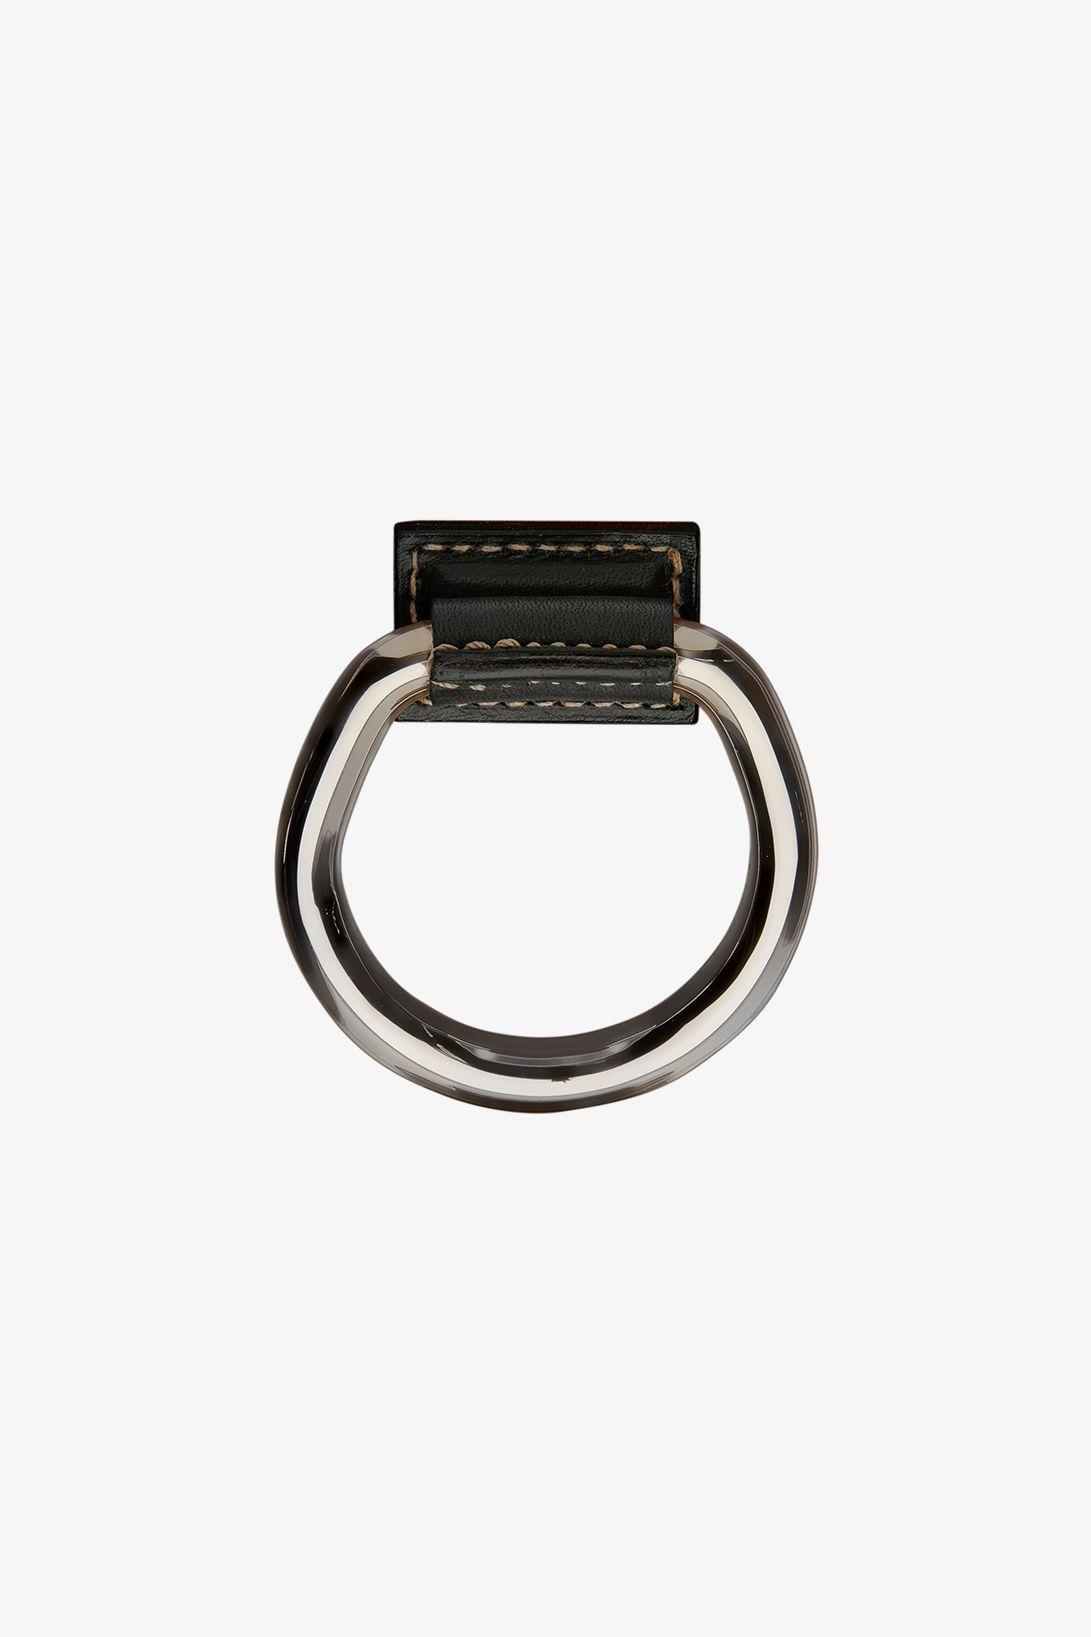 Pin on Hardware - Door + Cabinet Hardware